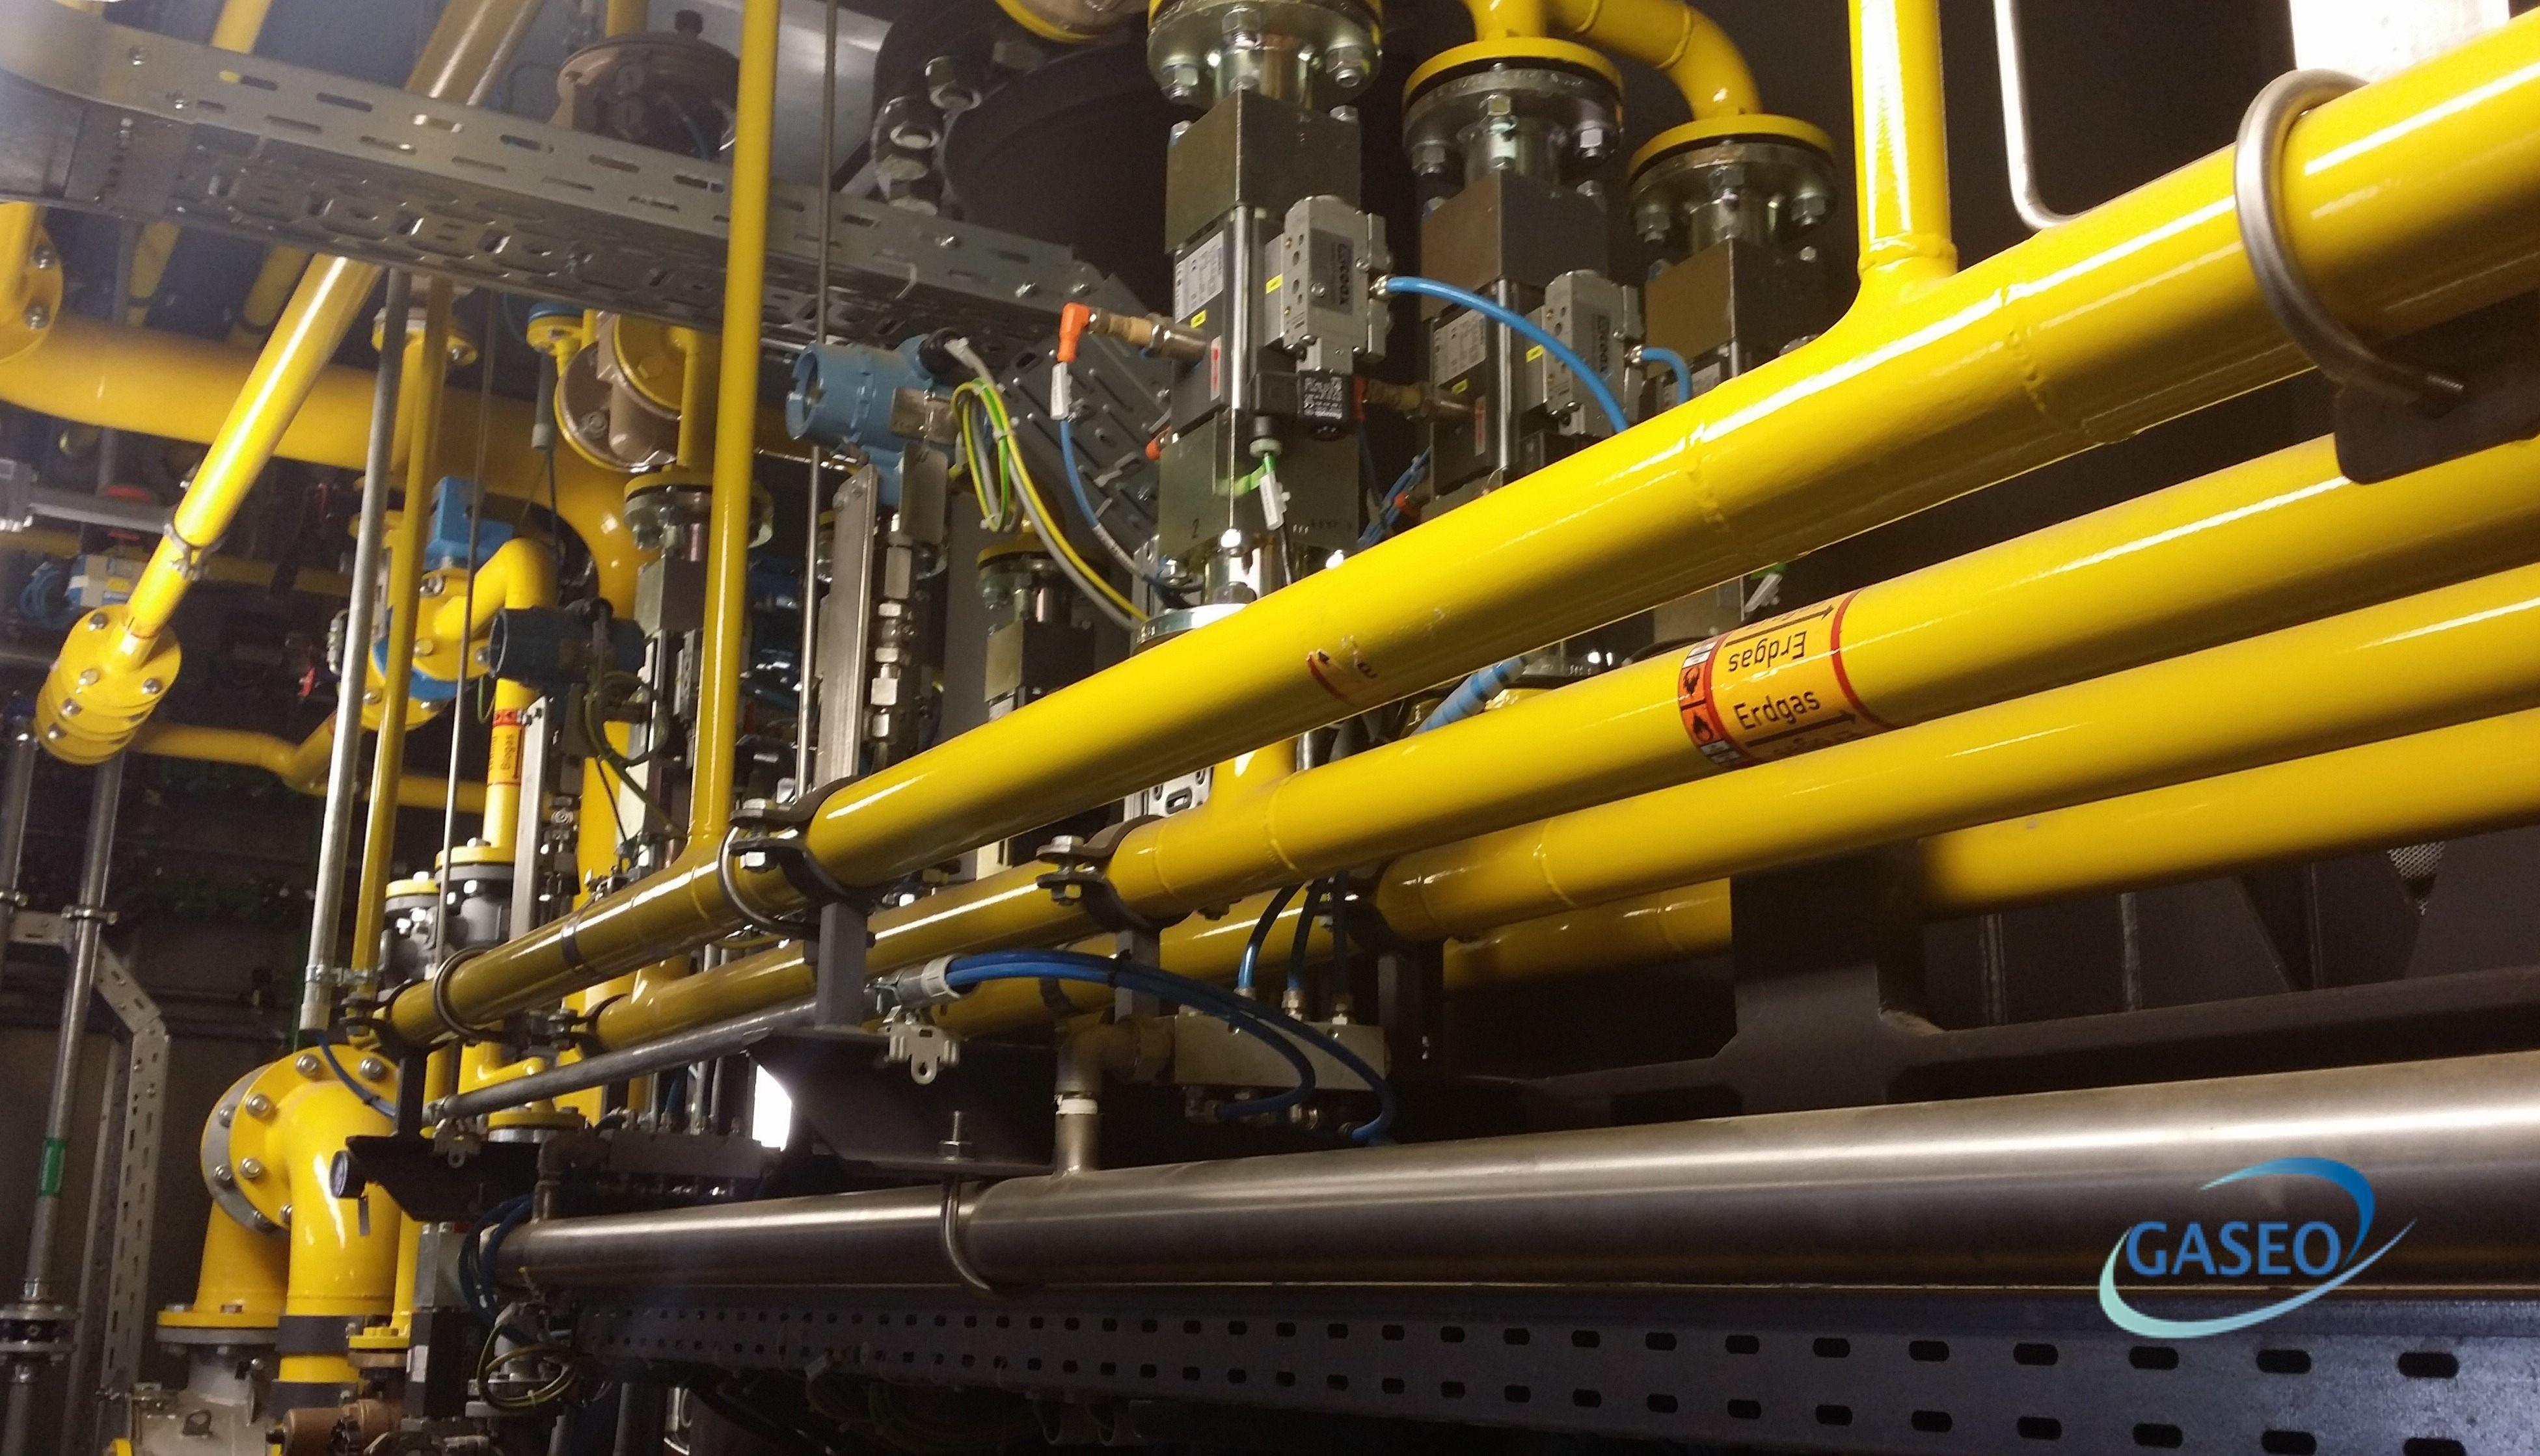 1b-gaseo-biomethane-psa-198